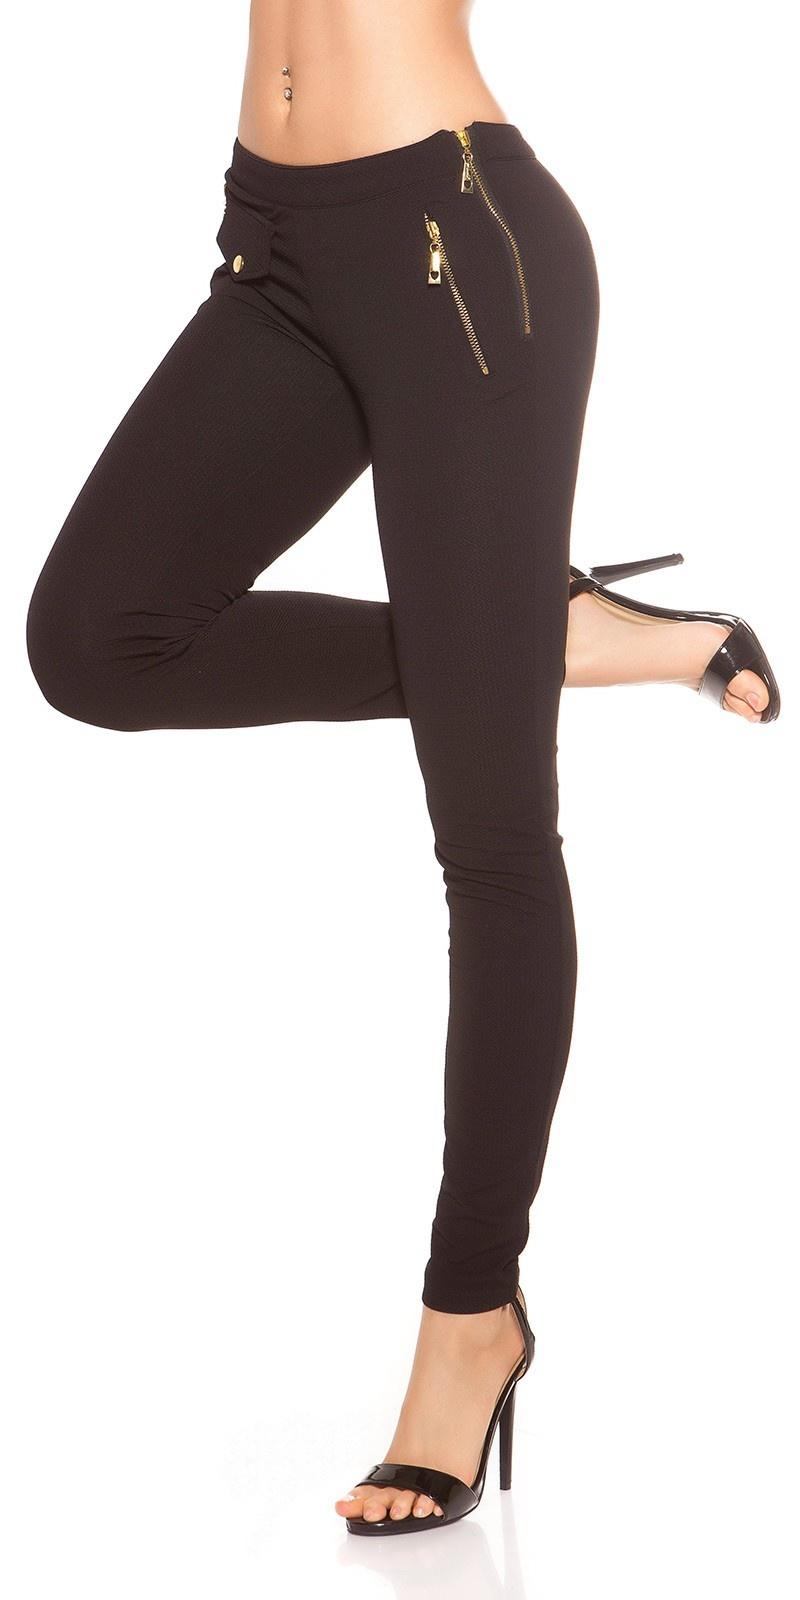 Trendy skinny business broek met ritssluiting zwart